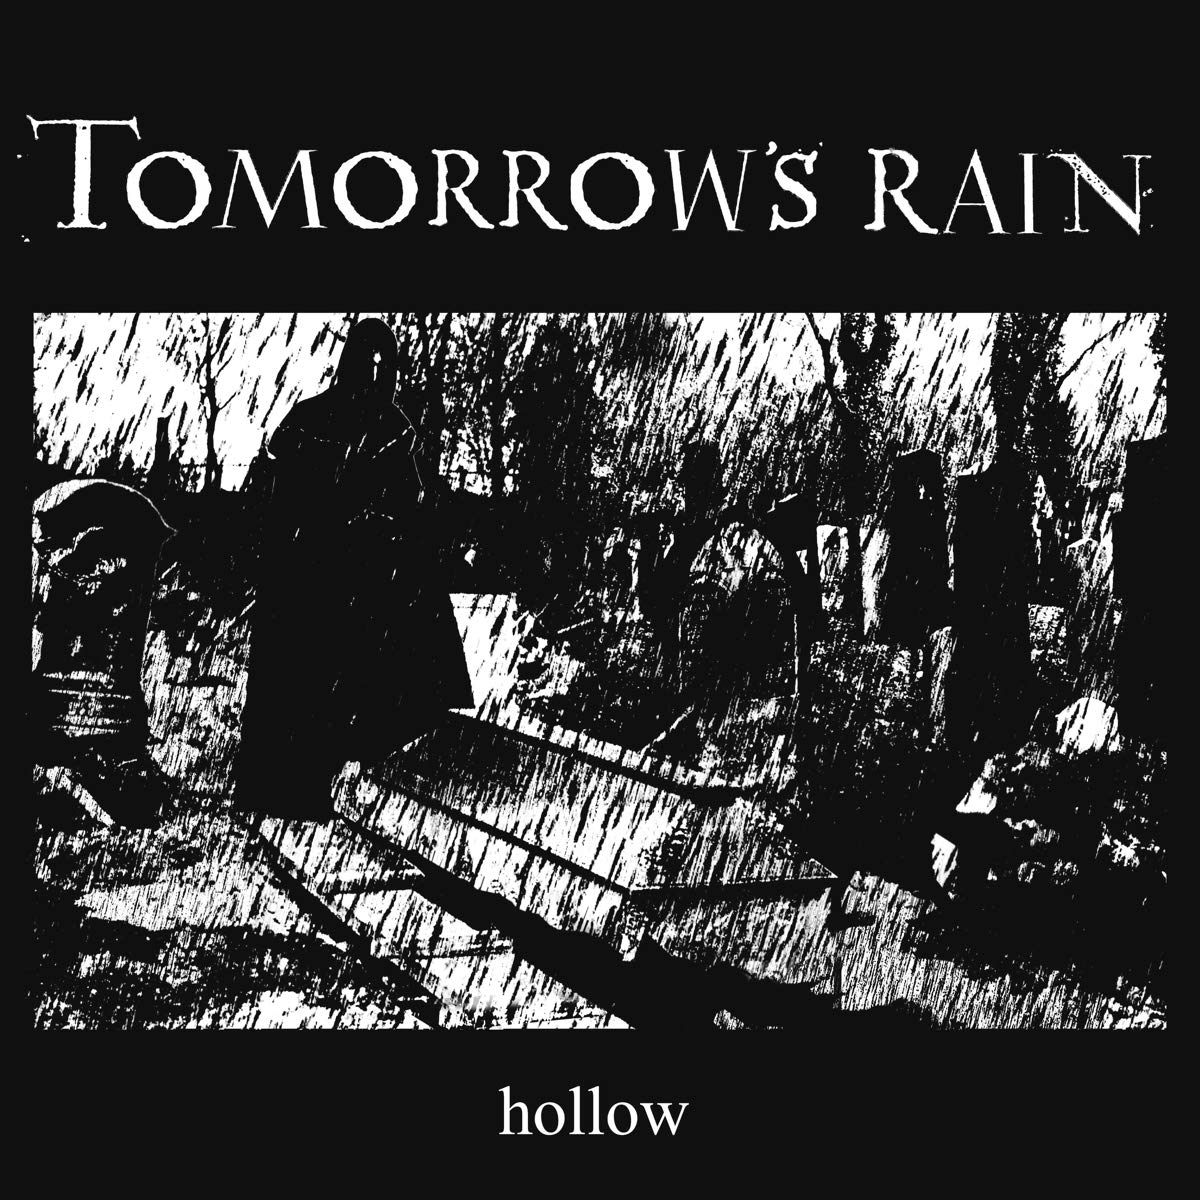 Tomorrow's Rain Hollow